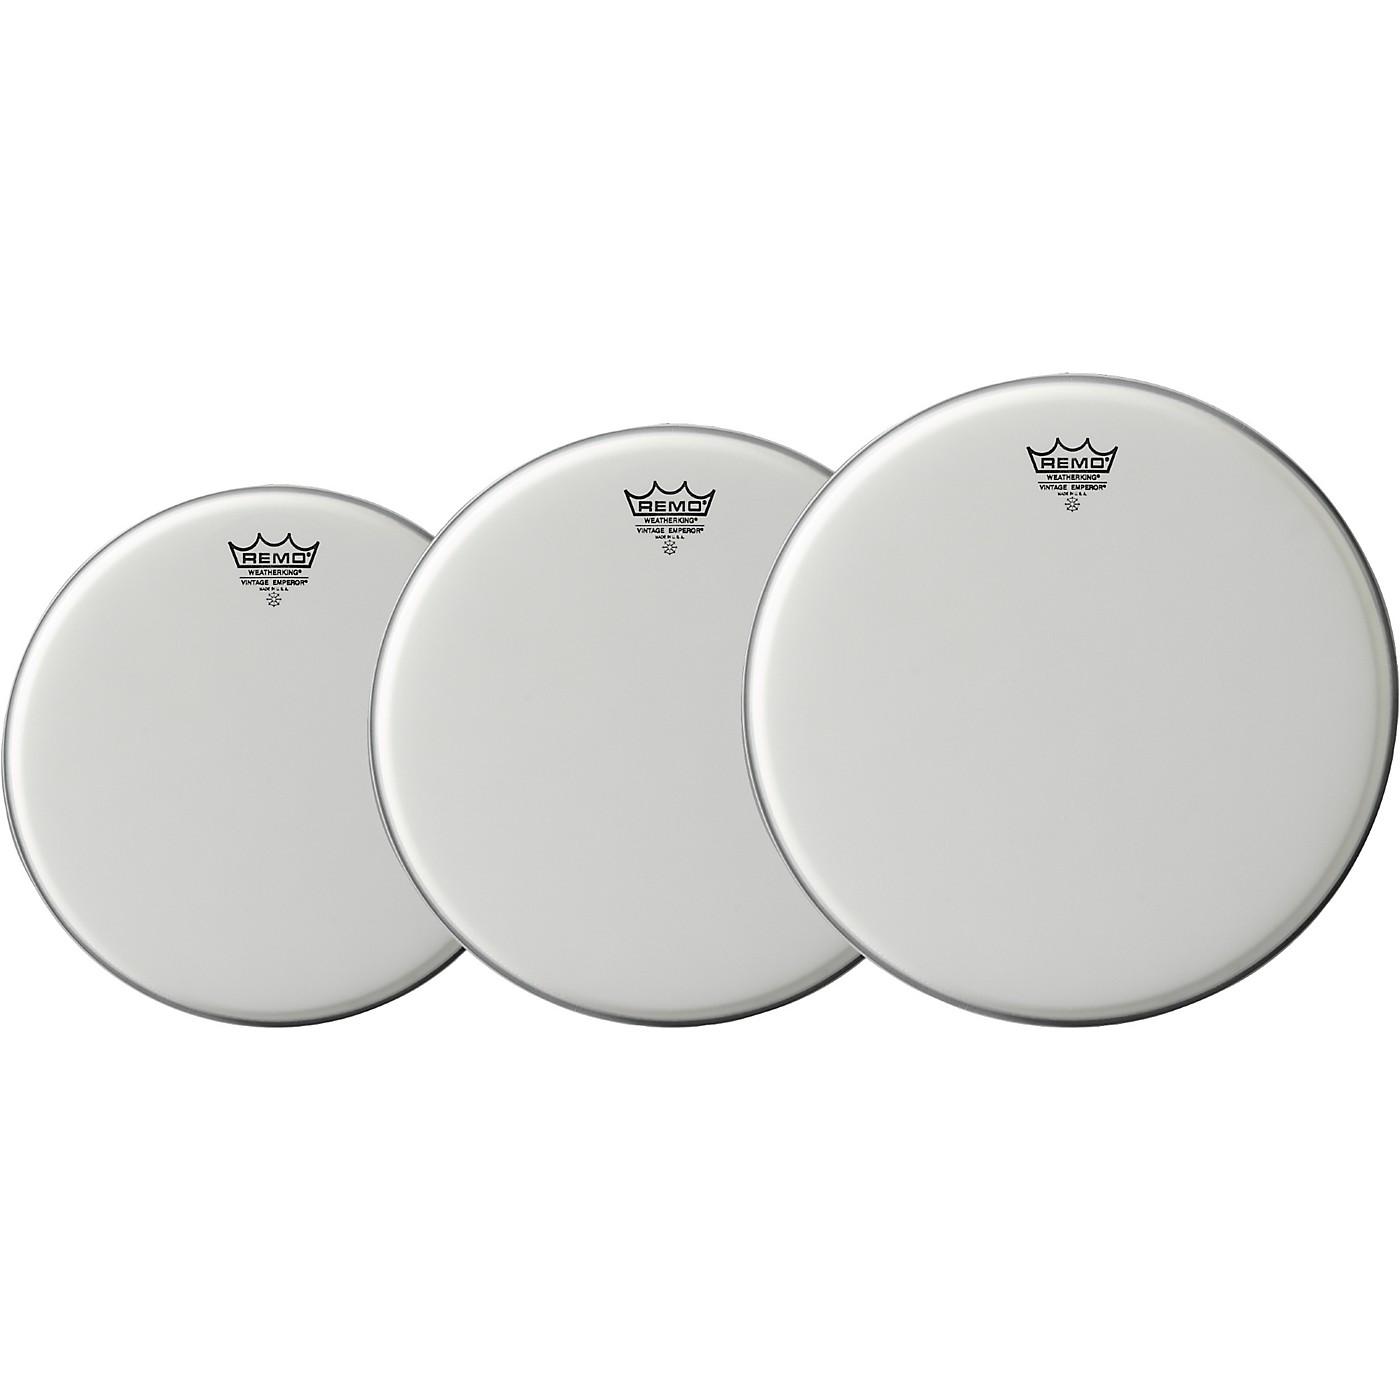 Remo Vintage Emperor Drum Head 3-Pack, 10/12/14 thumbnail